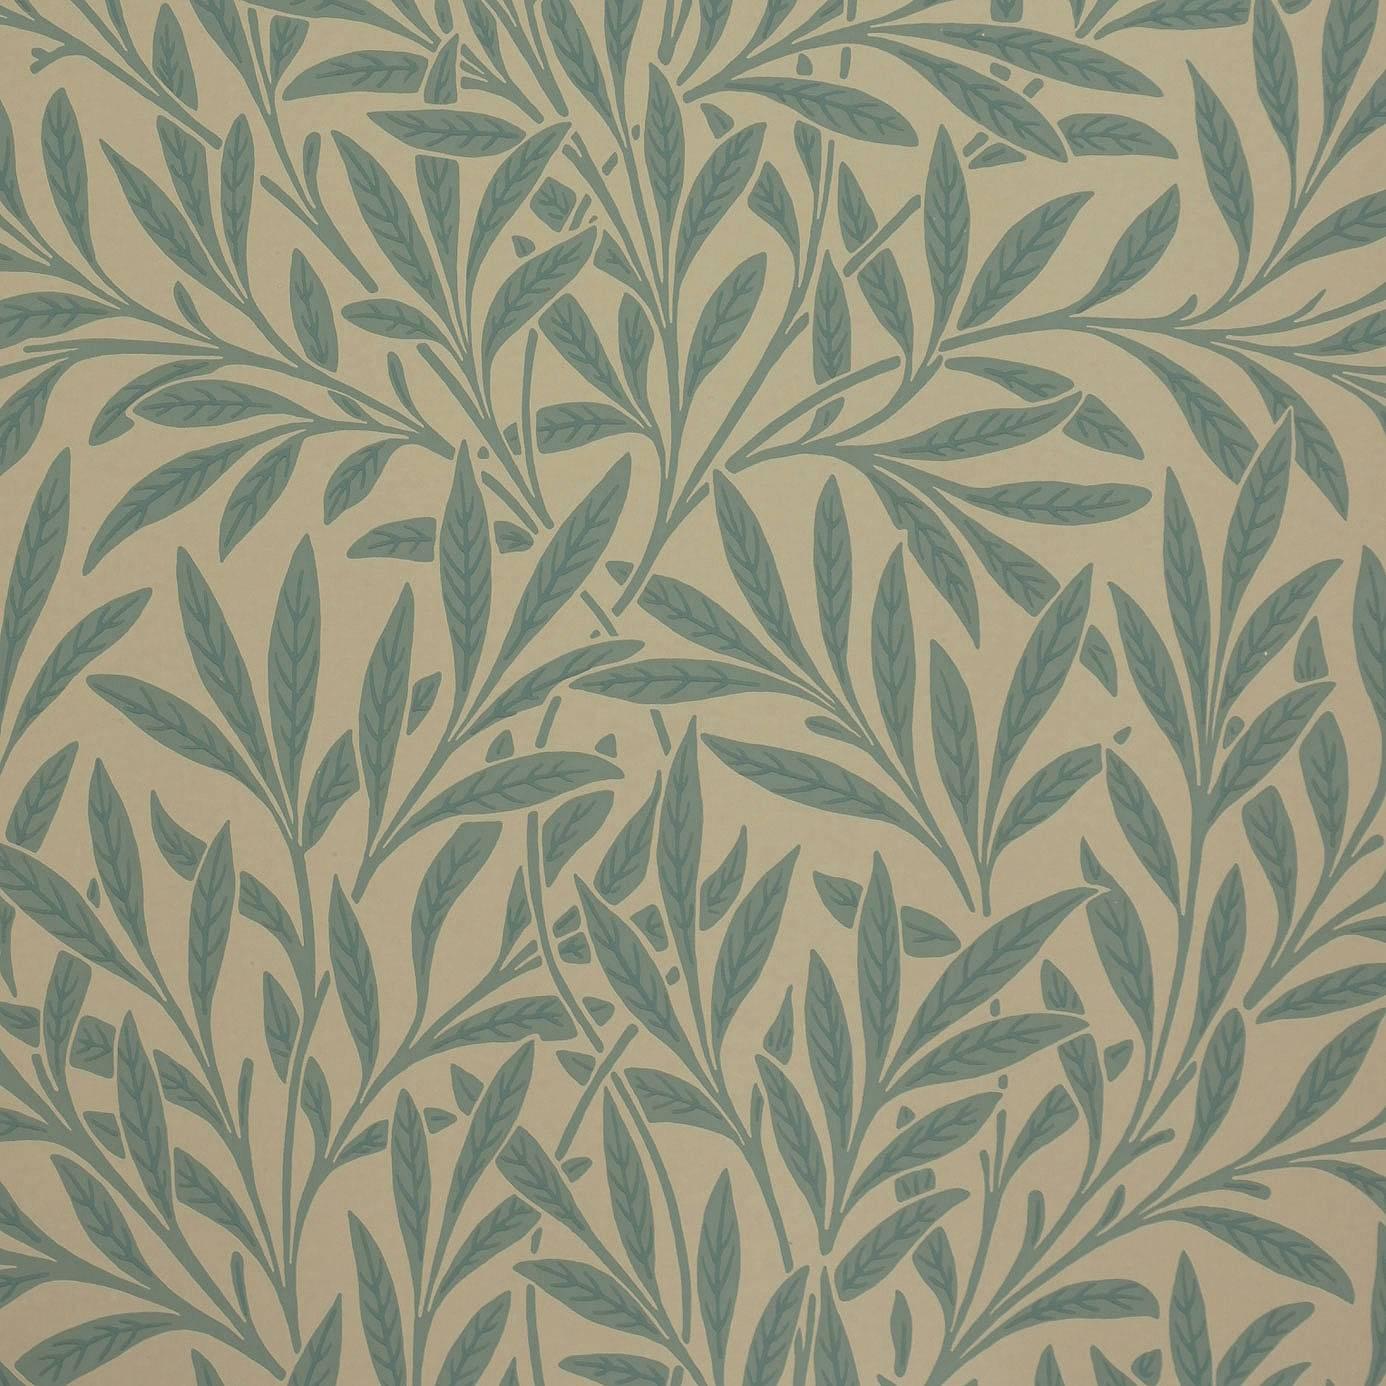 Willow Wallpaper - Slate (210382) - William Morris & Co ...